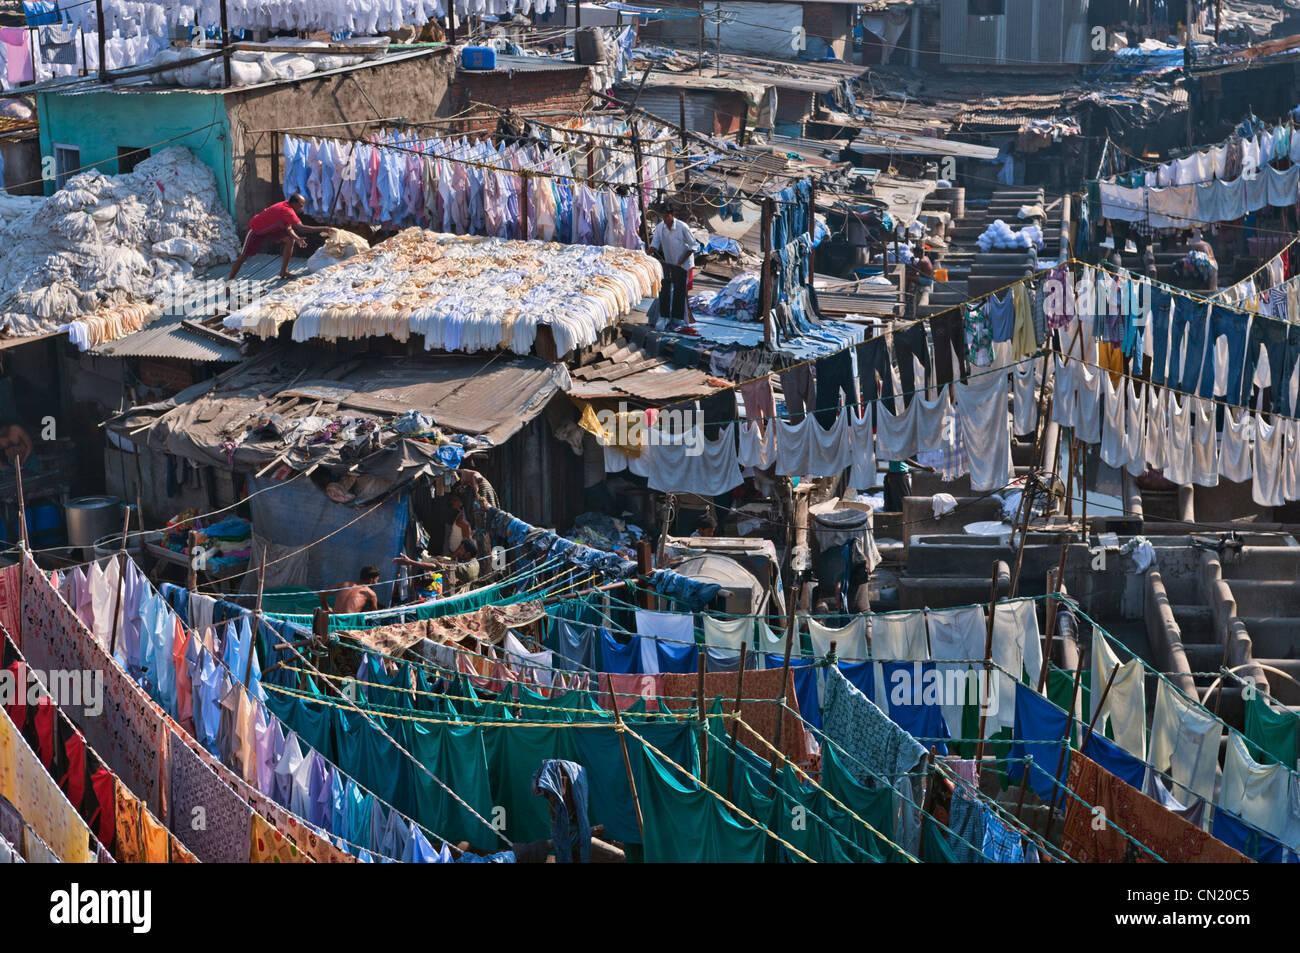 Mahalaxmi Dhobi Ghat Outdoor laundry Mumbai Bombay India - Stock Image